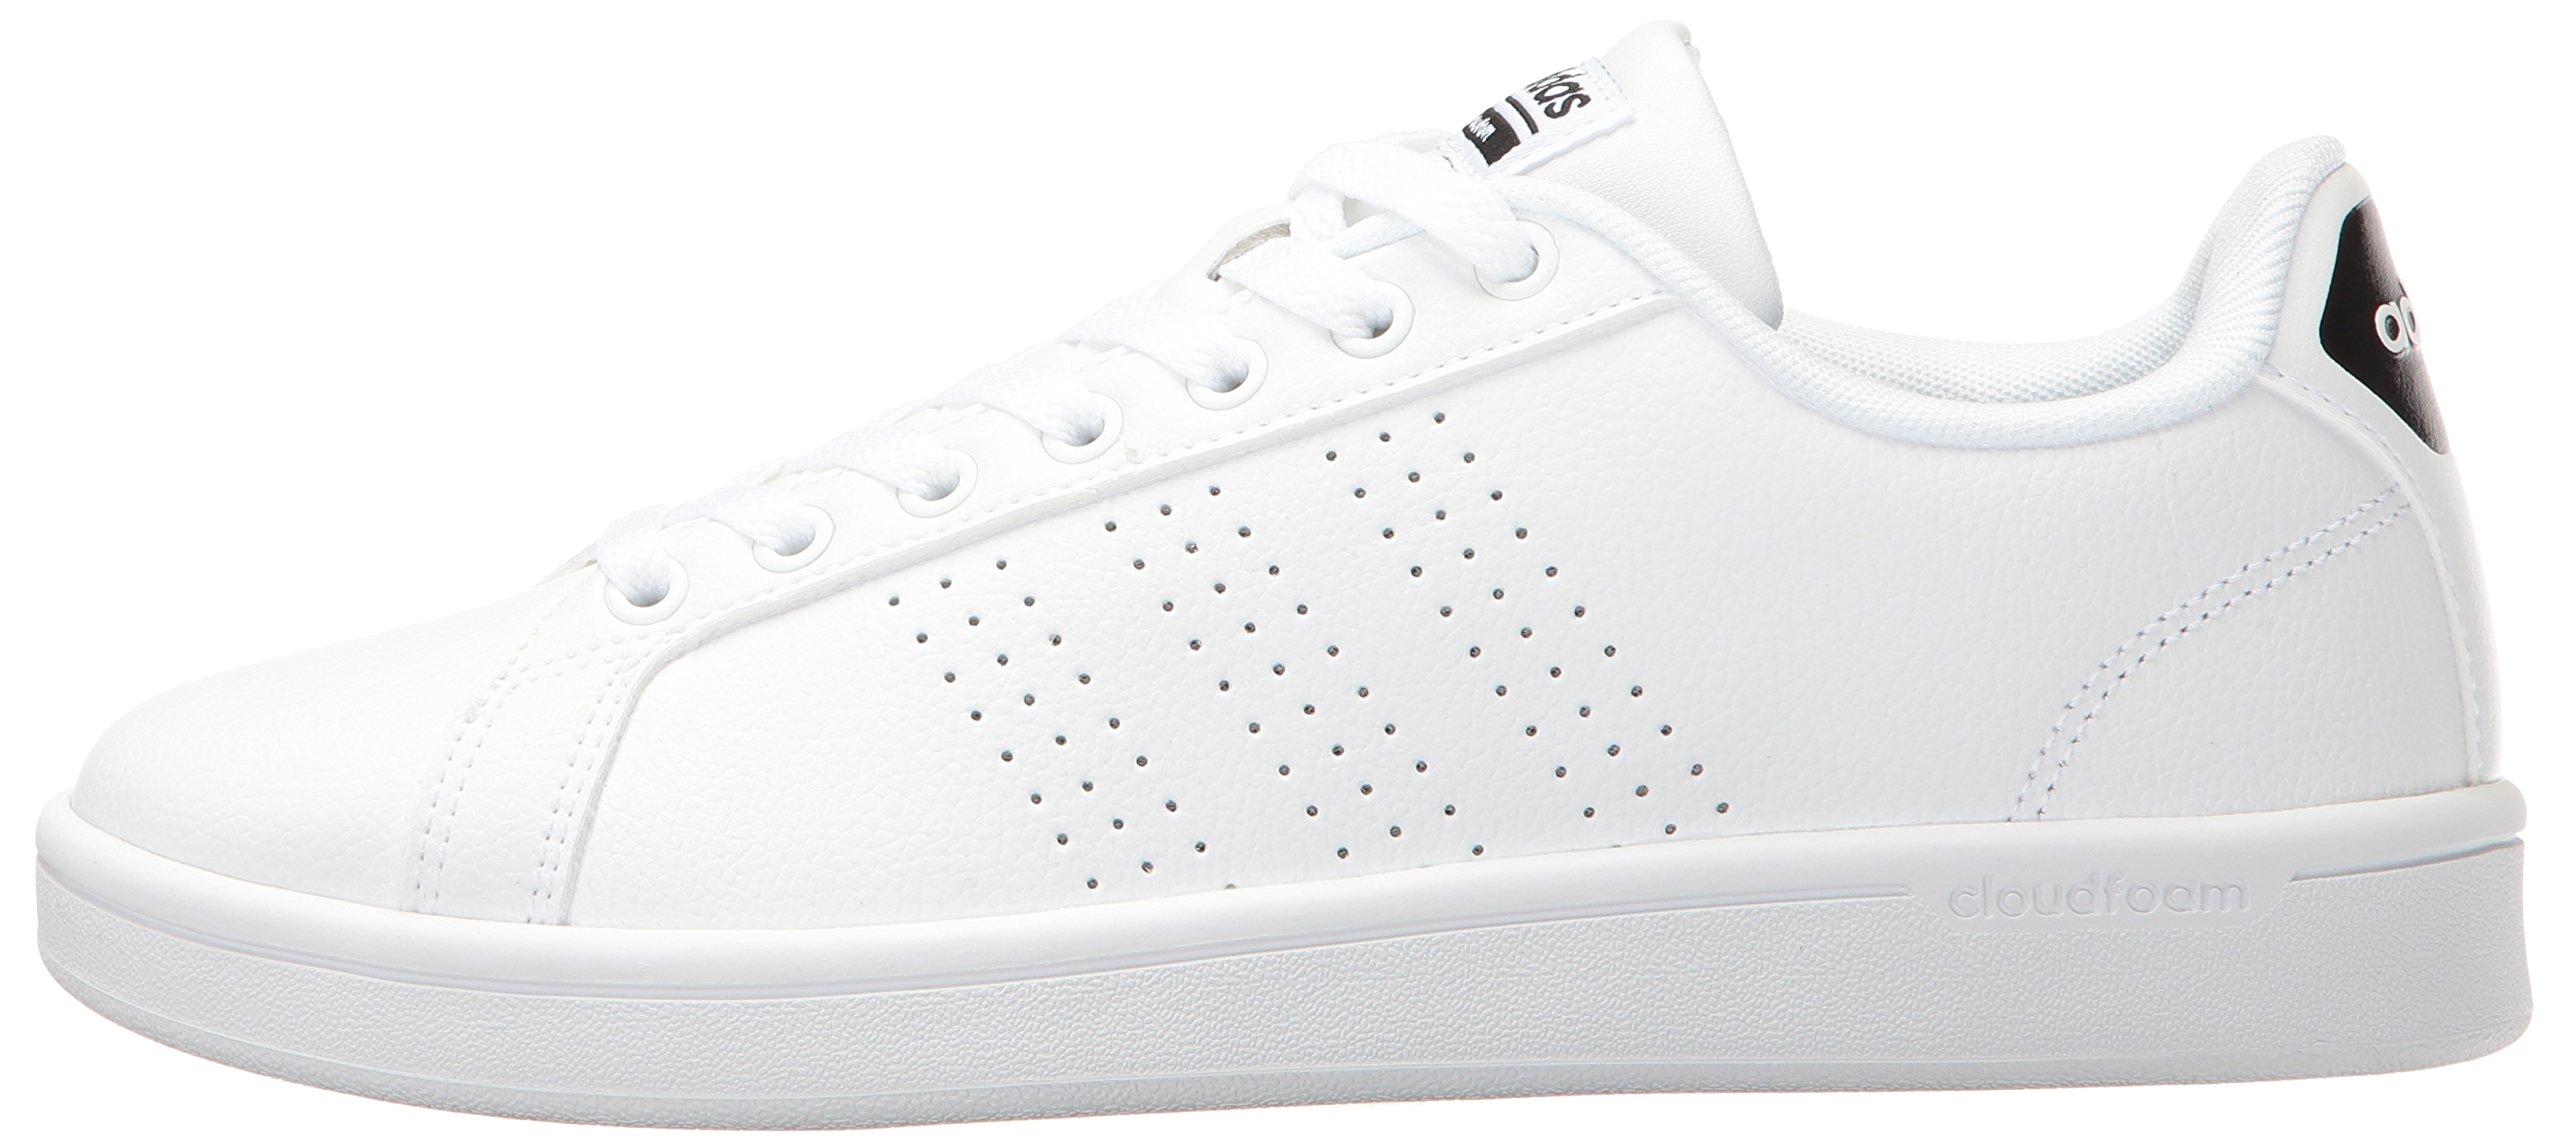 adidas Women's Shoes Cloudfoam Advantage Clean Sneakers, White/White/Black, (7.5 M US) by adidas (Image #5)